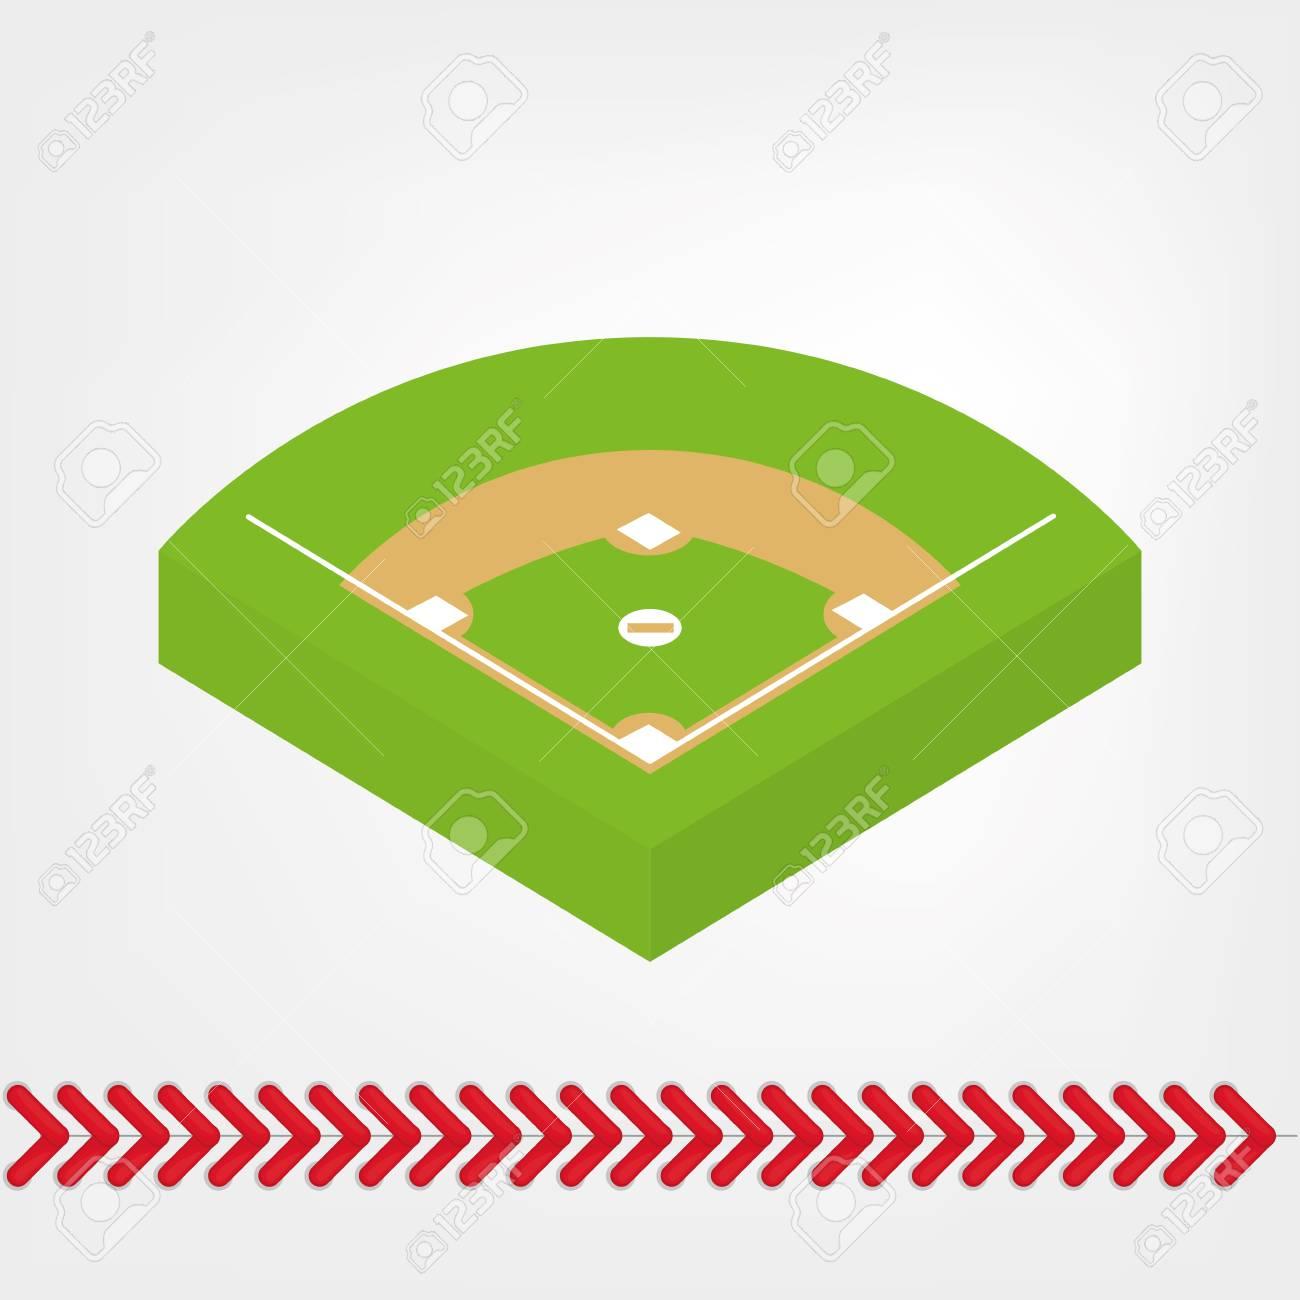 1300x1300 Baseball Field Graphic Free Download Clip Art